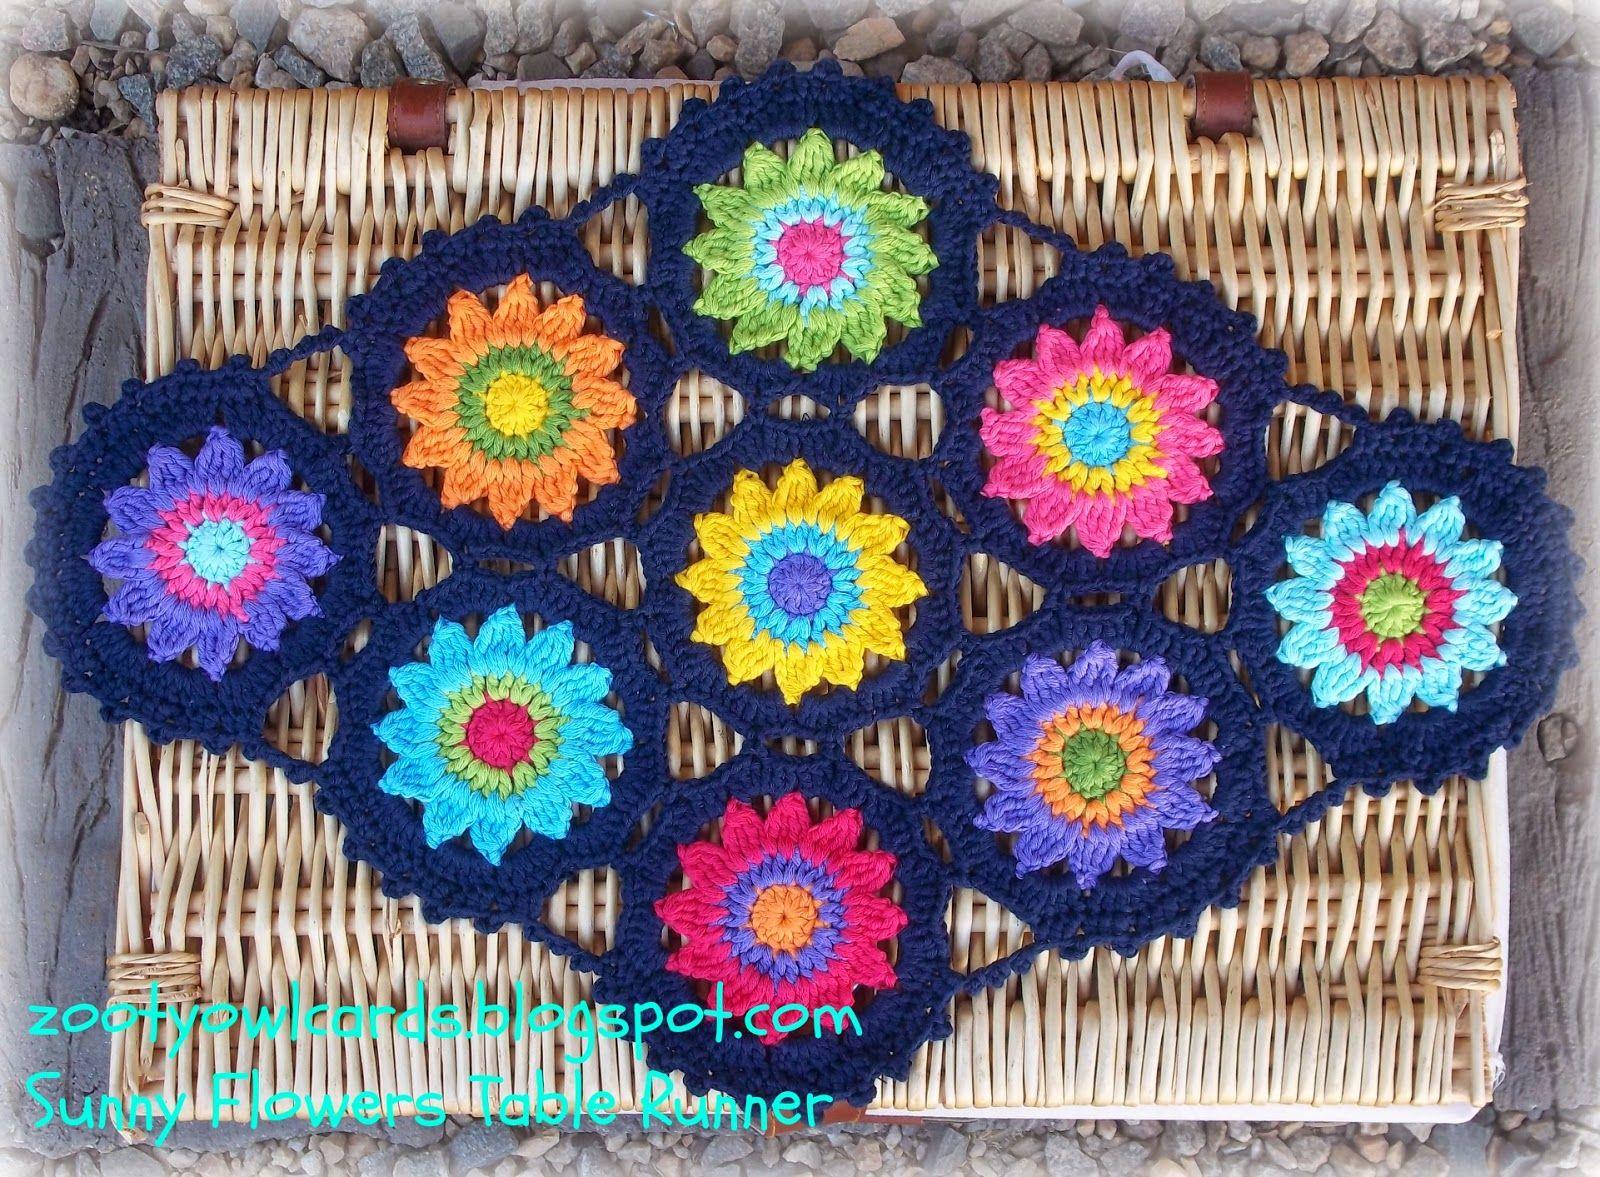 Zooty owls crafty blog sunny flower motif table runner free zooty owls crafty blog sunny flower motif table runner free pattern bankloansurffo Choice Image